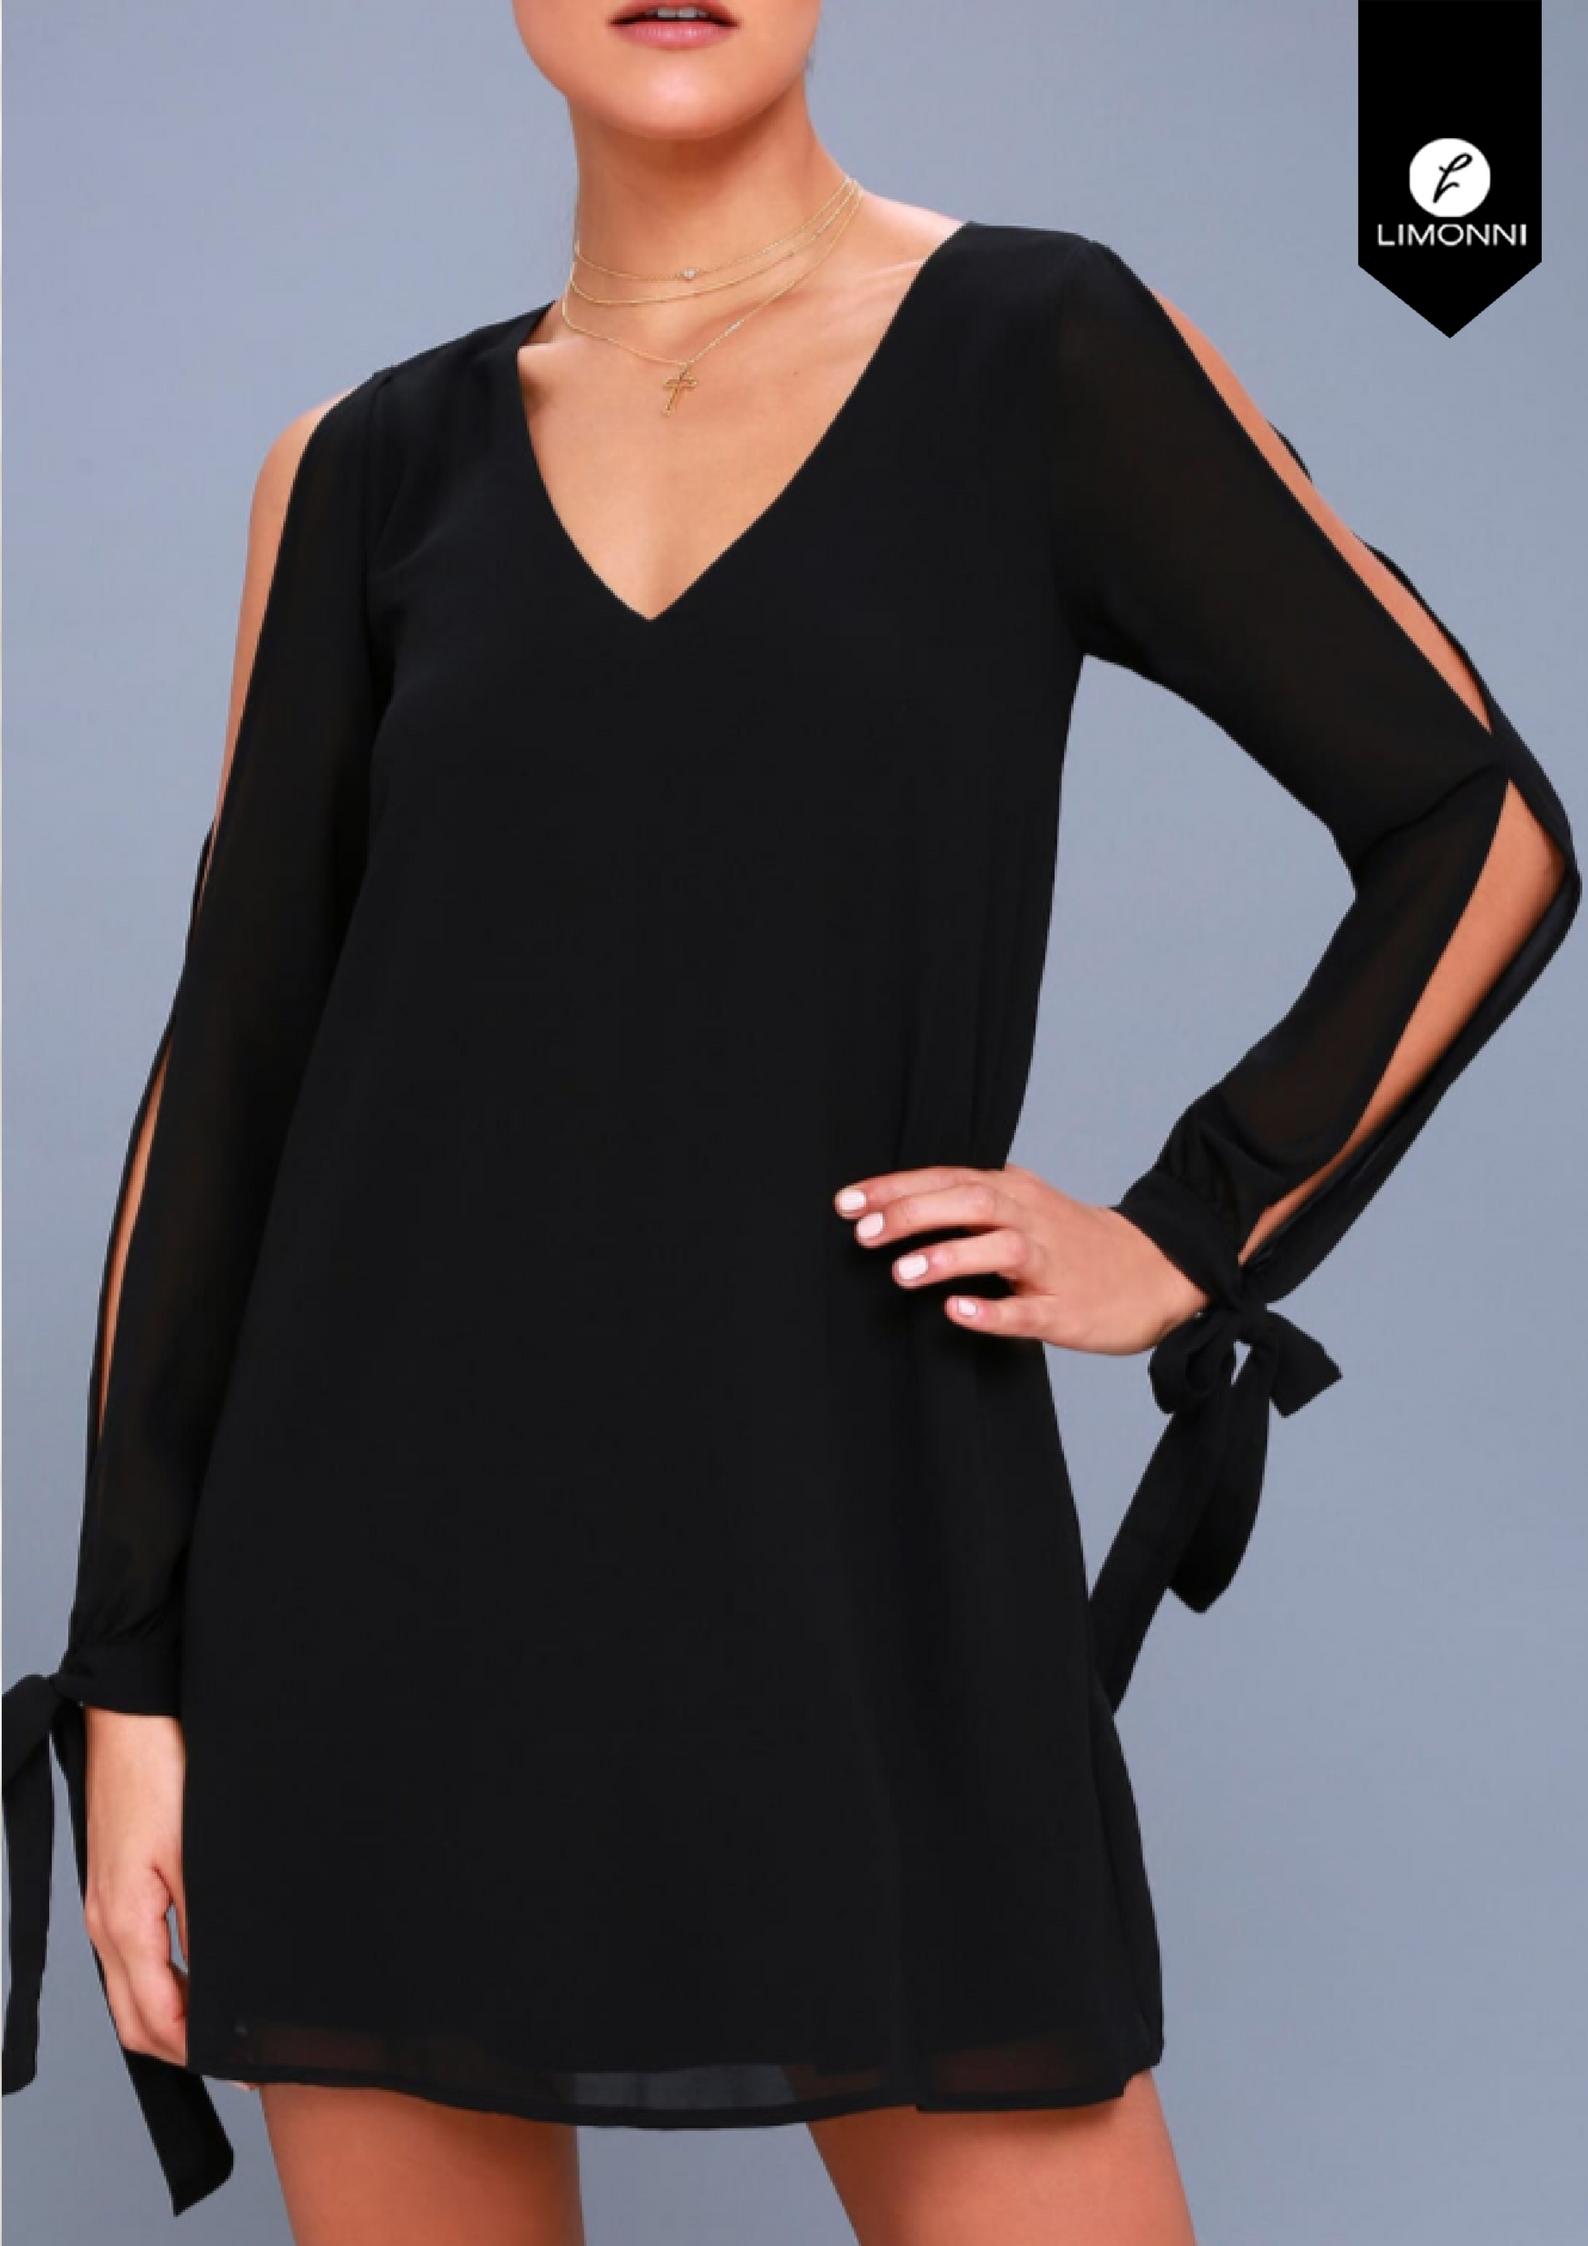 Vestidos para mujer Limonni Limonni LI1499 Cortos elegantes